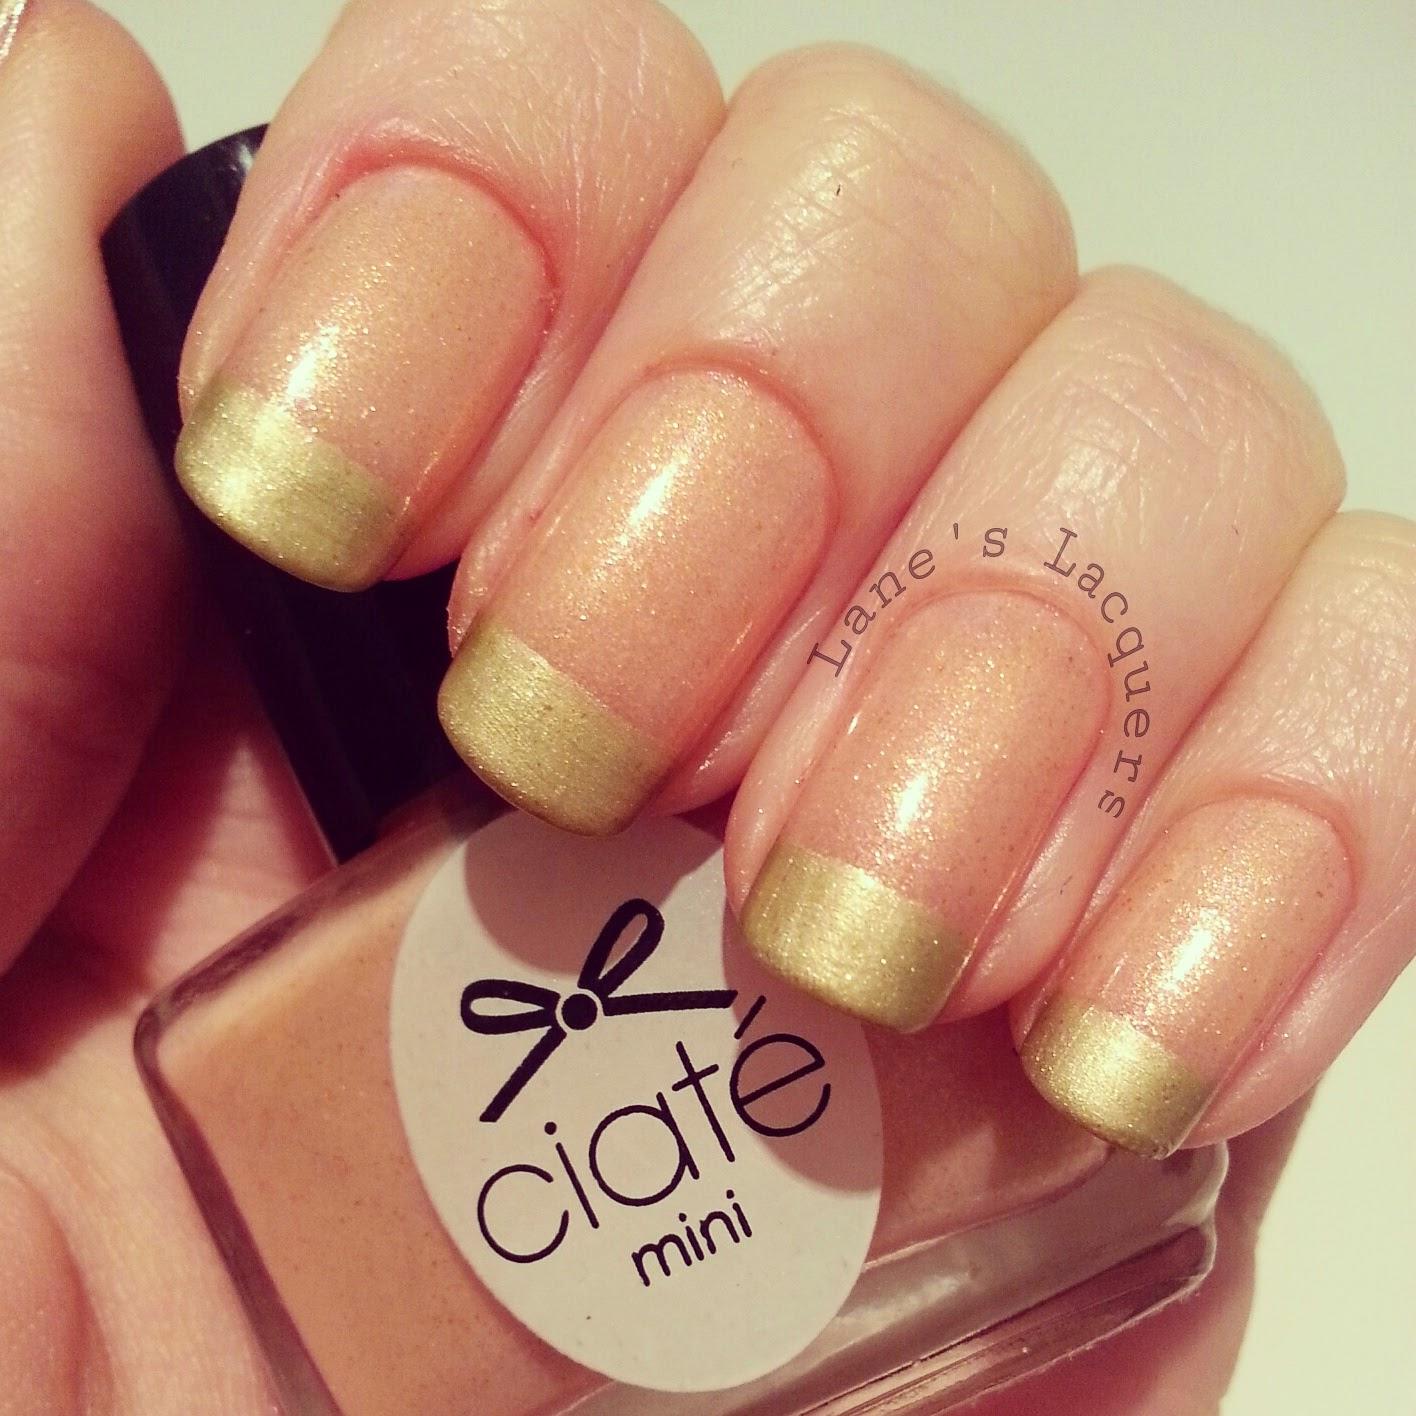 ciate-mini-mani-manor-sloaney-sweetie-white-glitter-nails (2)